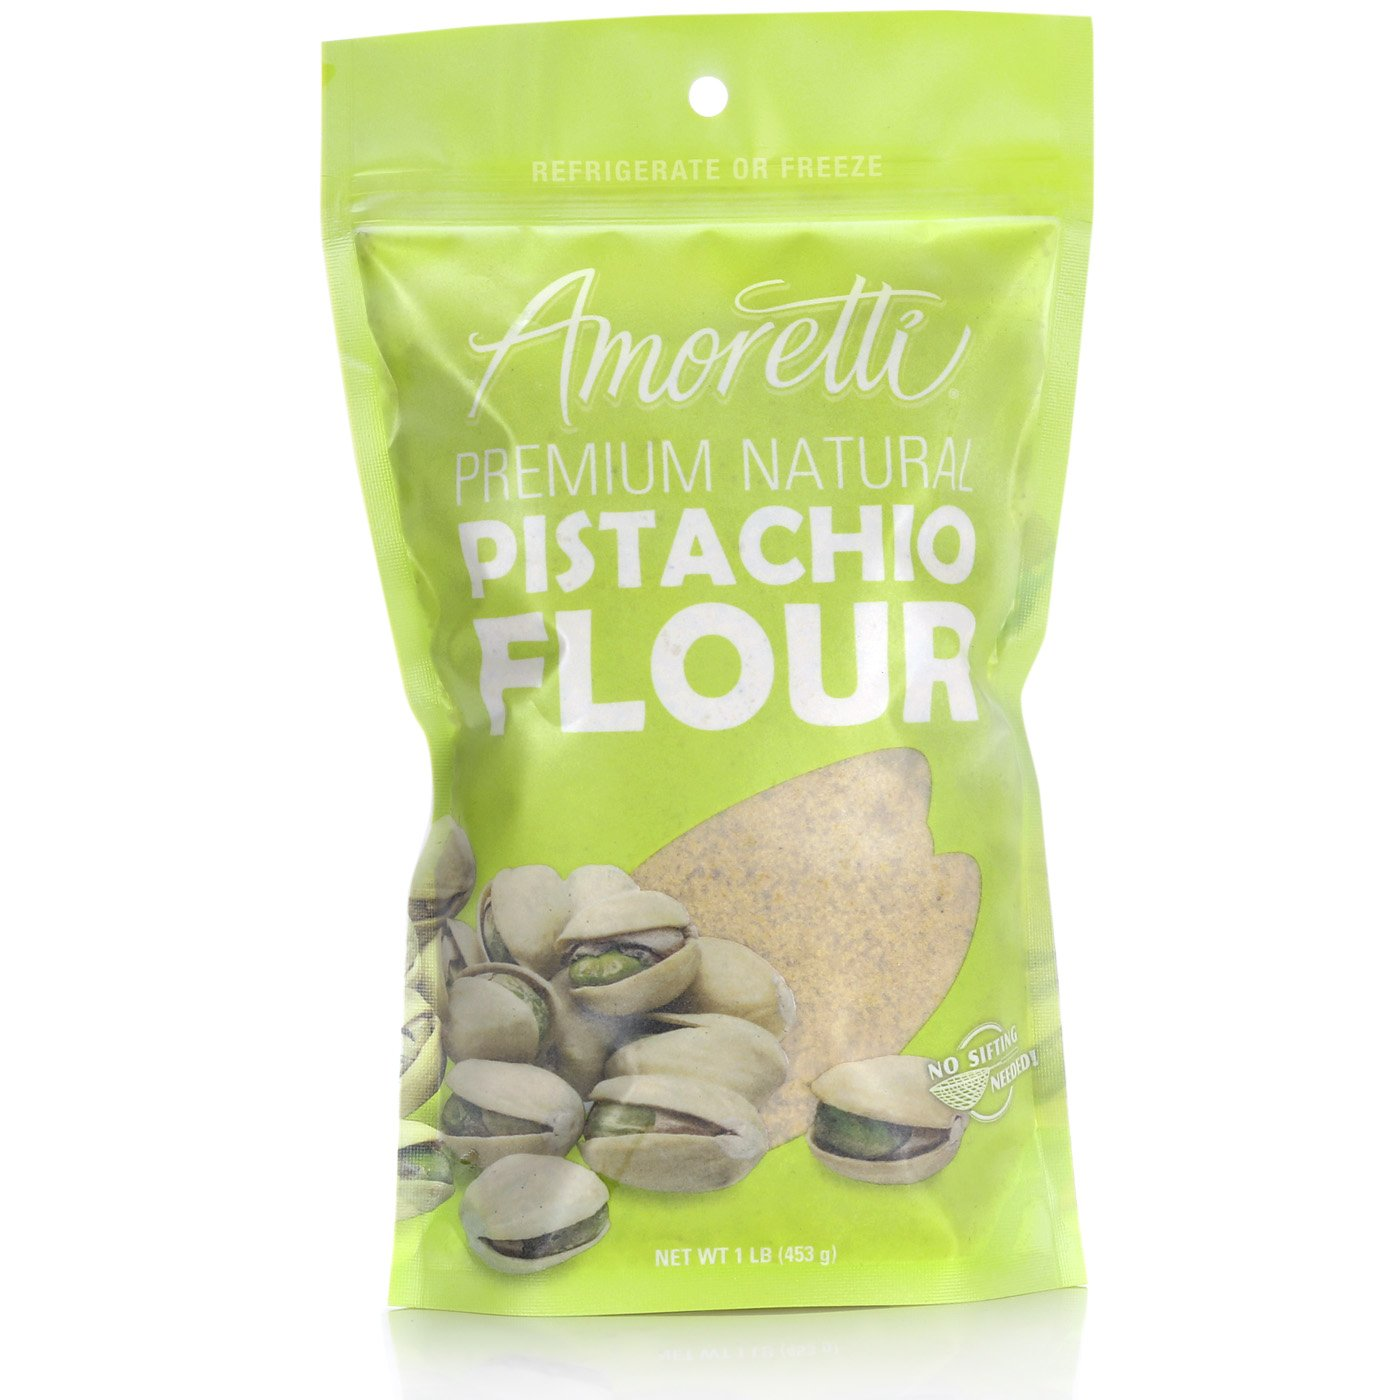 Amoretti Premium Natural Pistachio Flour, 1 Pound by Amoretti